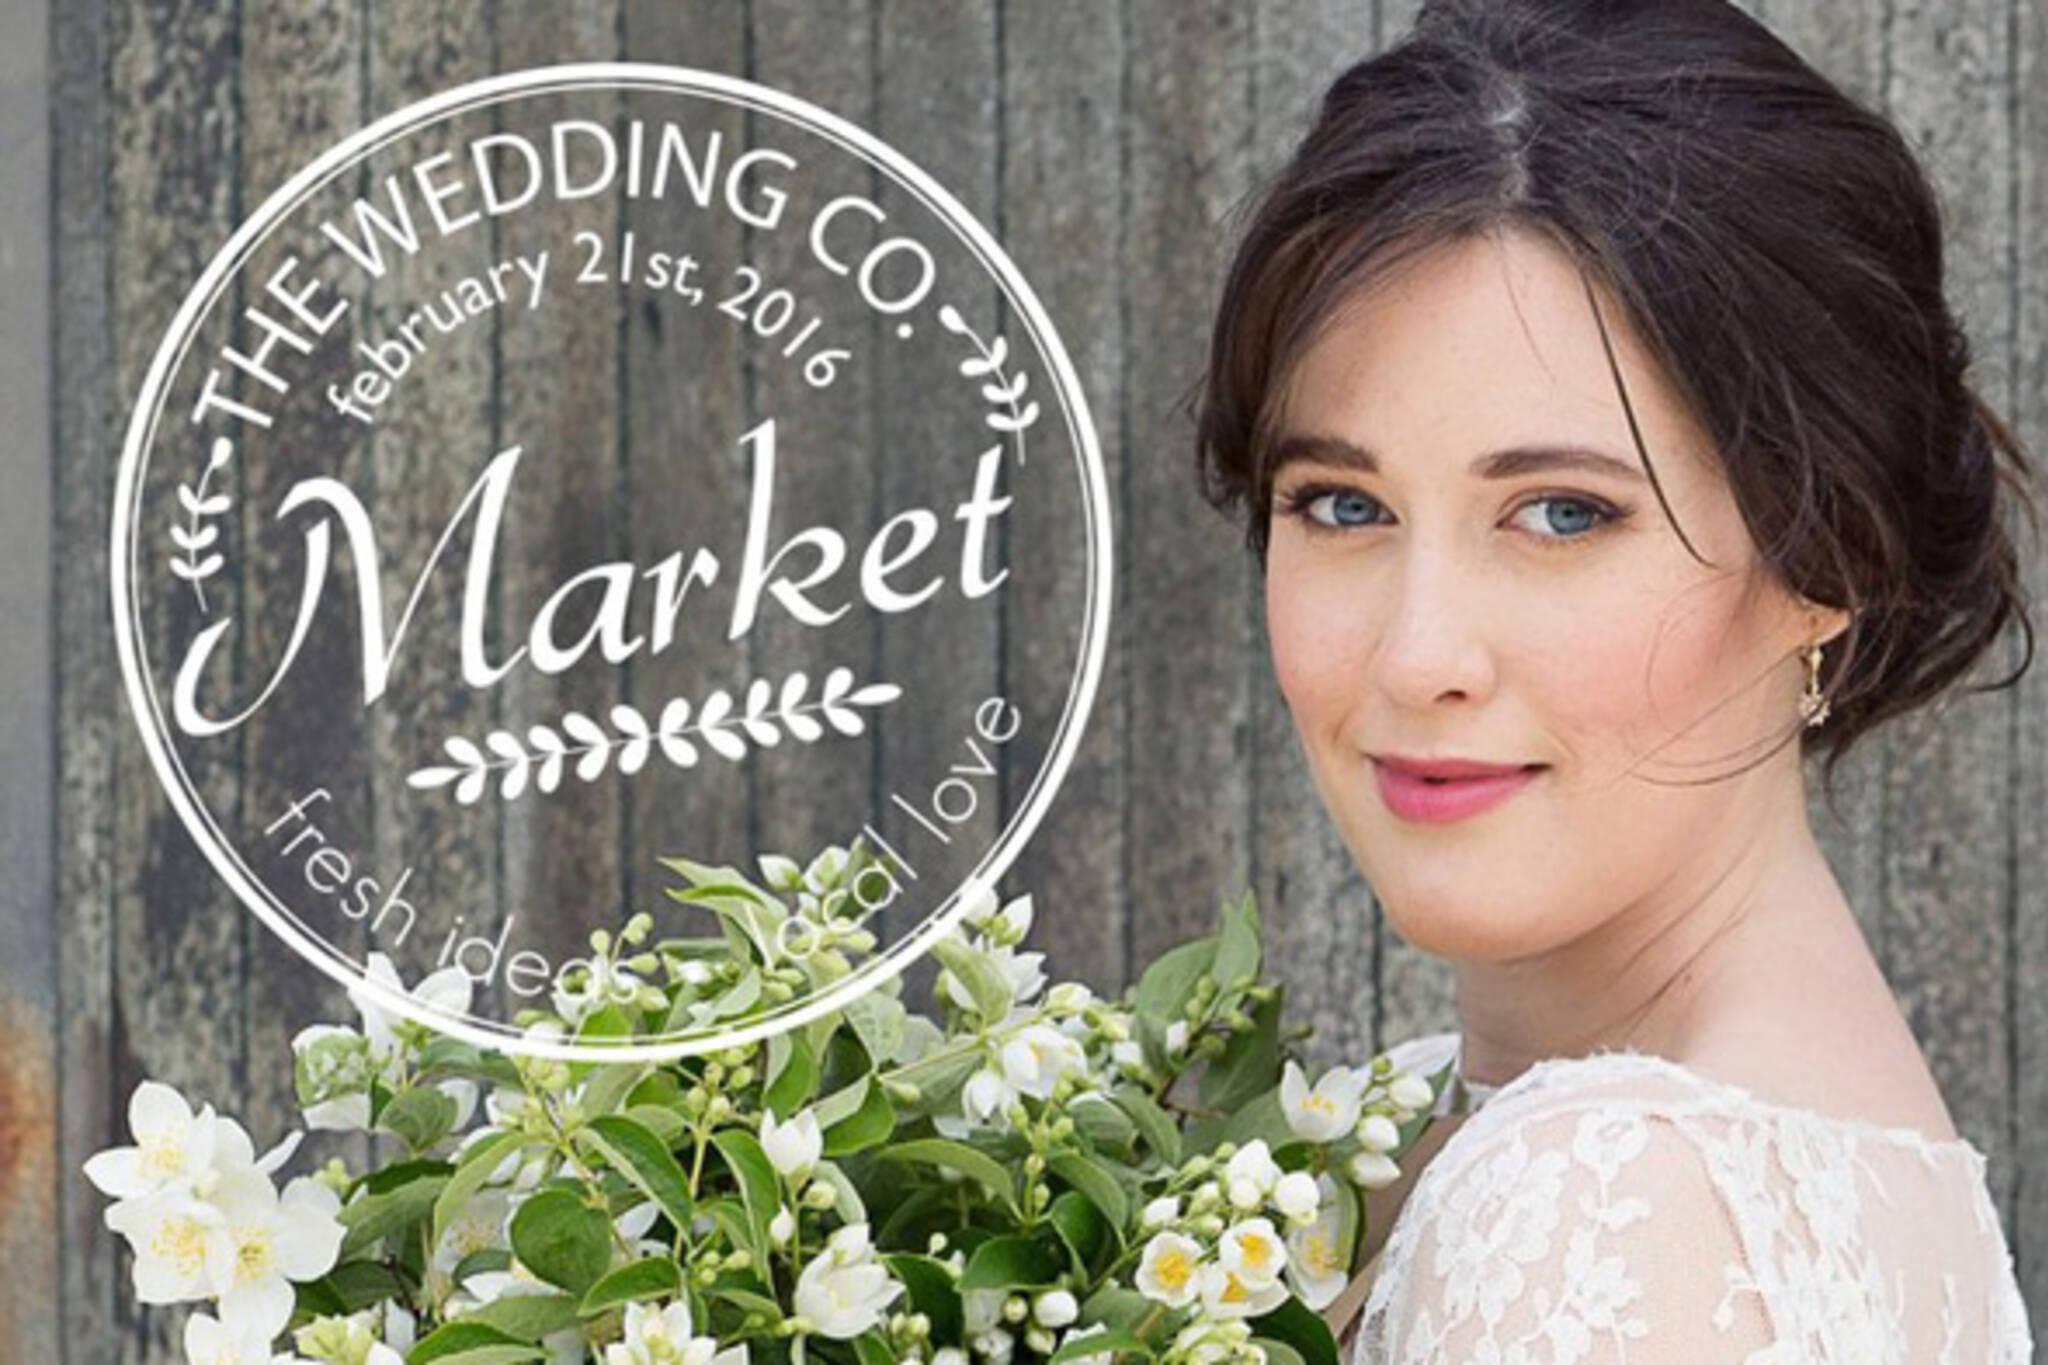 wedding co market